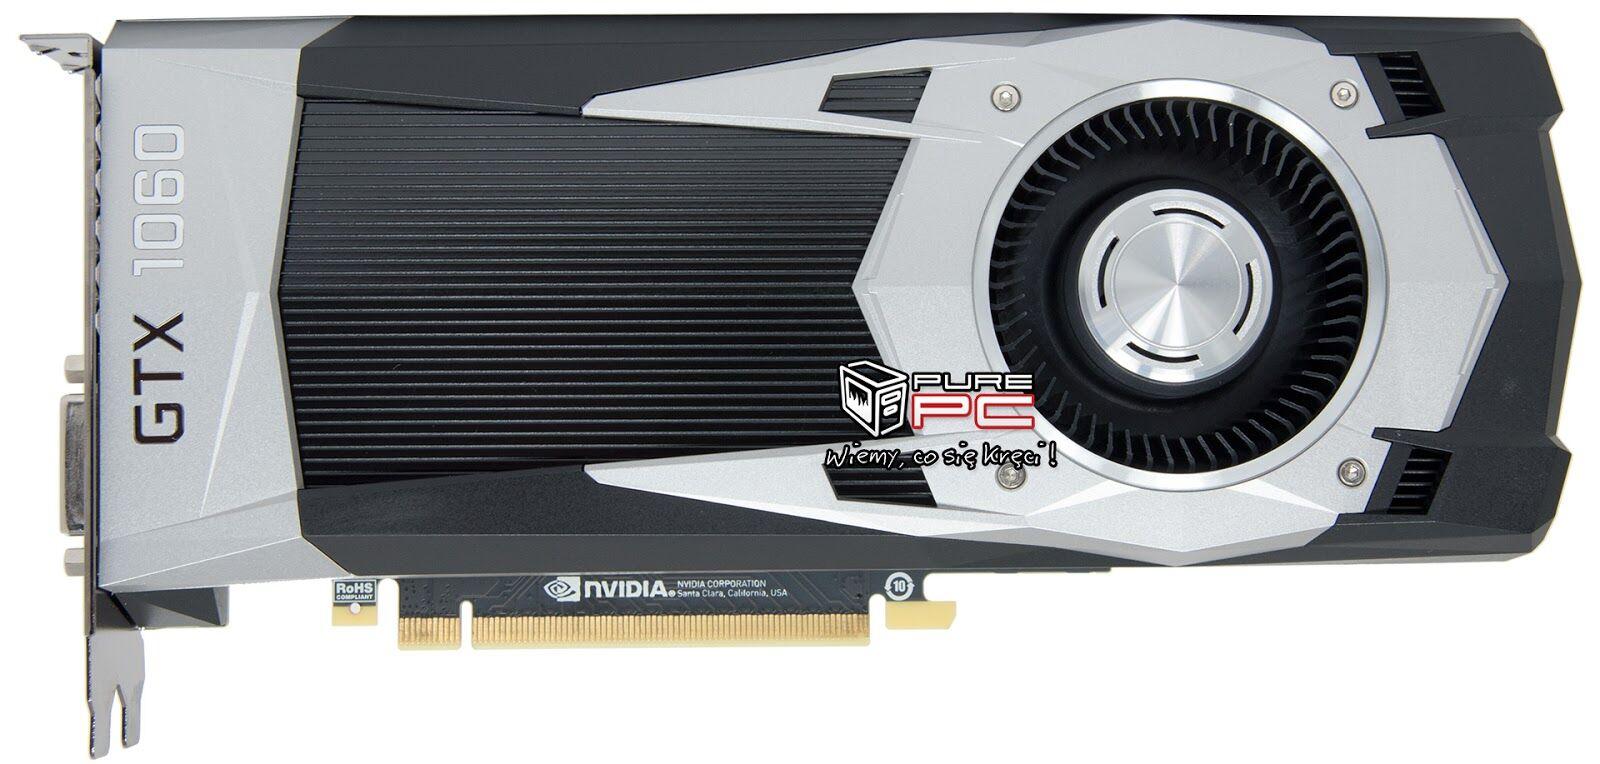 NVIDIA GeForce GTX 1060 10% faster than AMD RX 480! 30